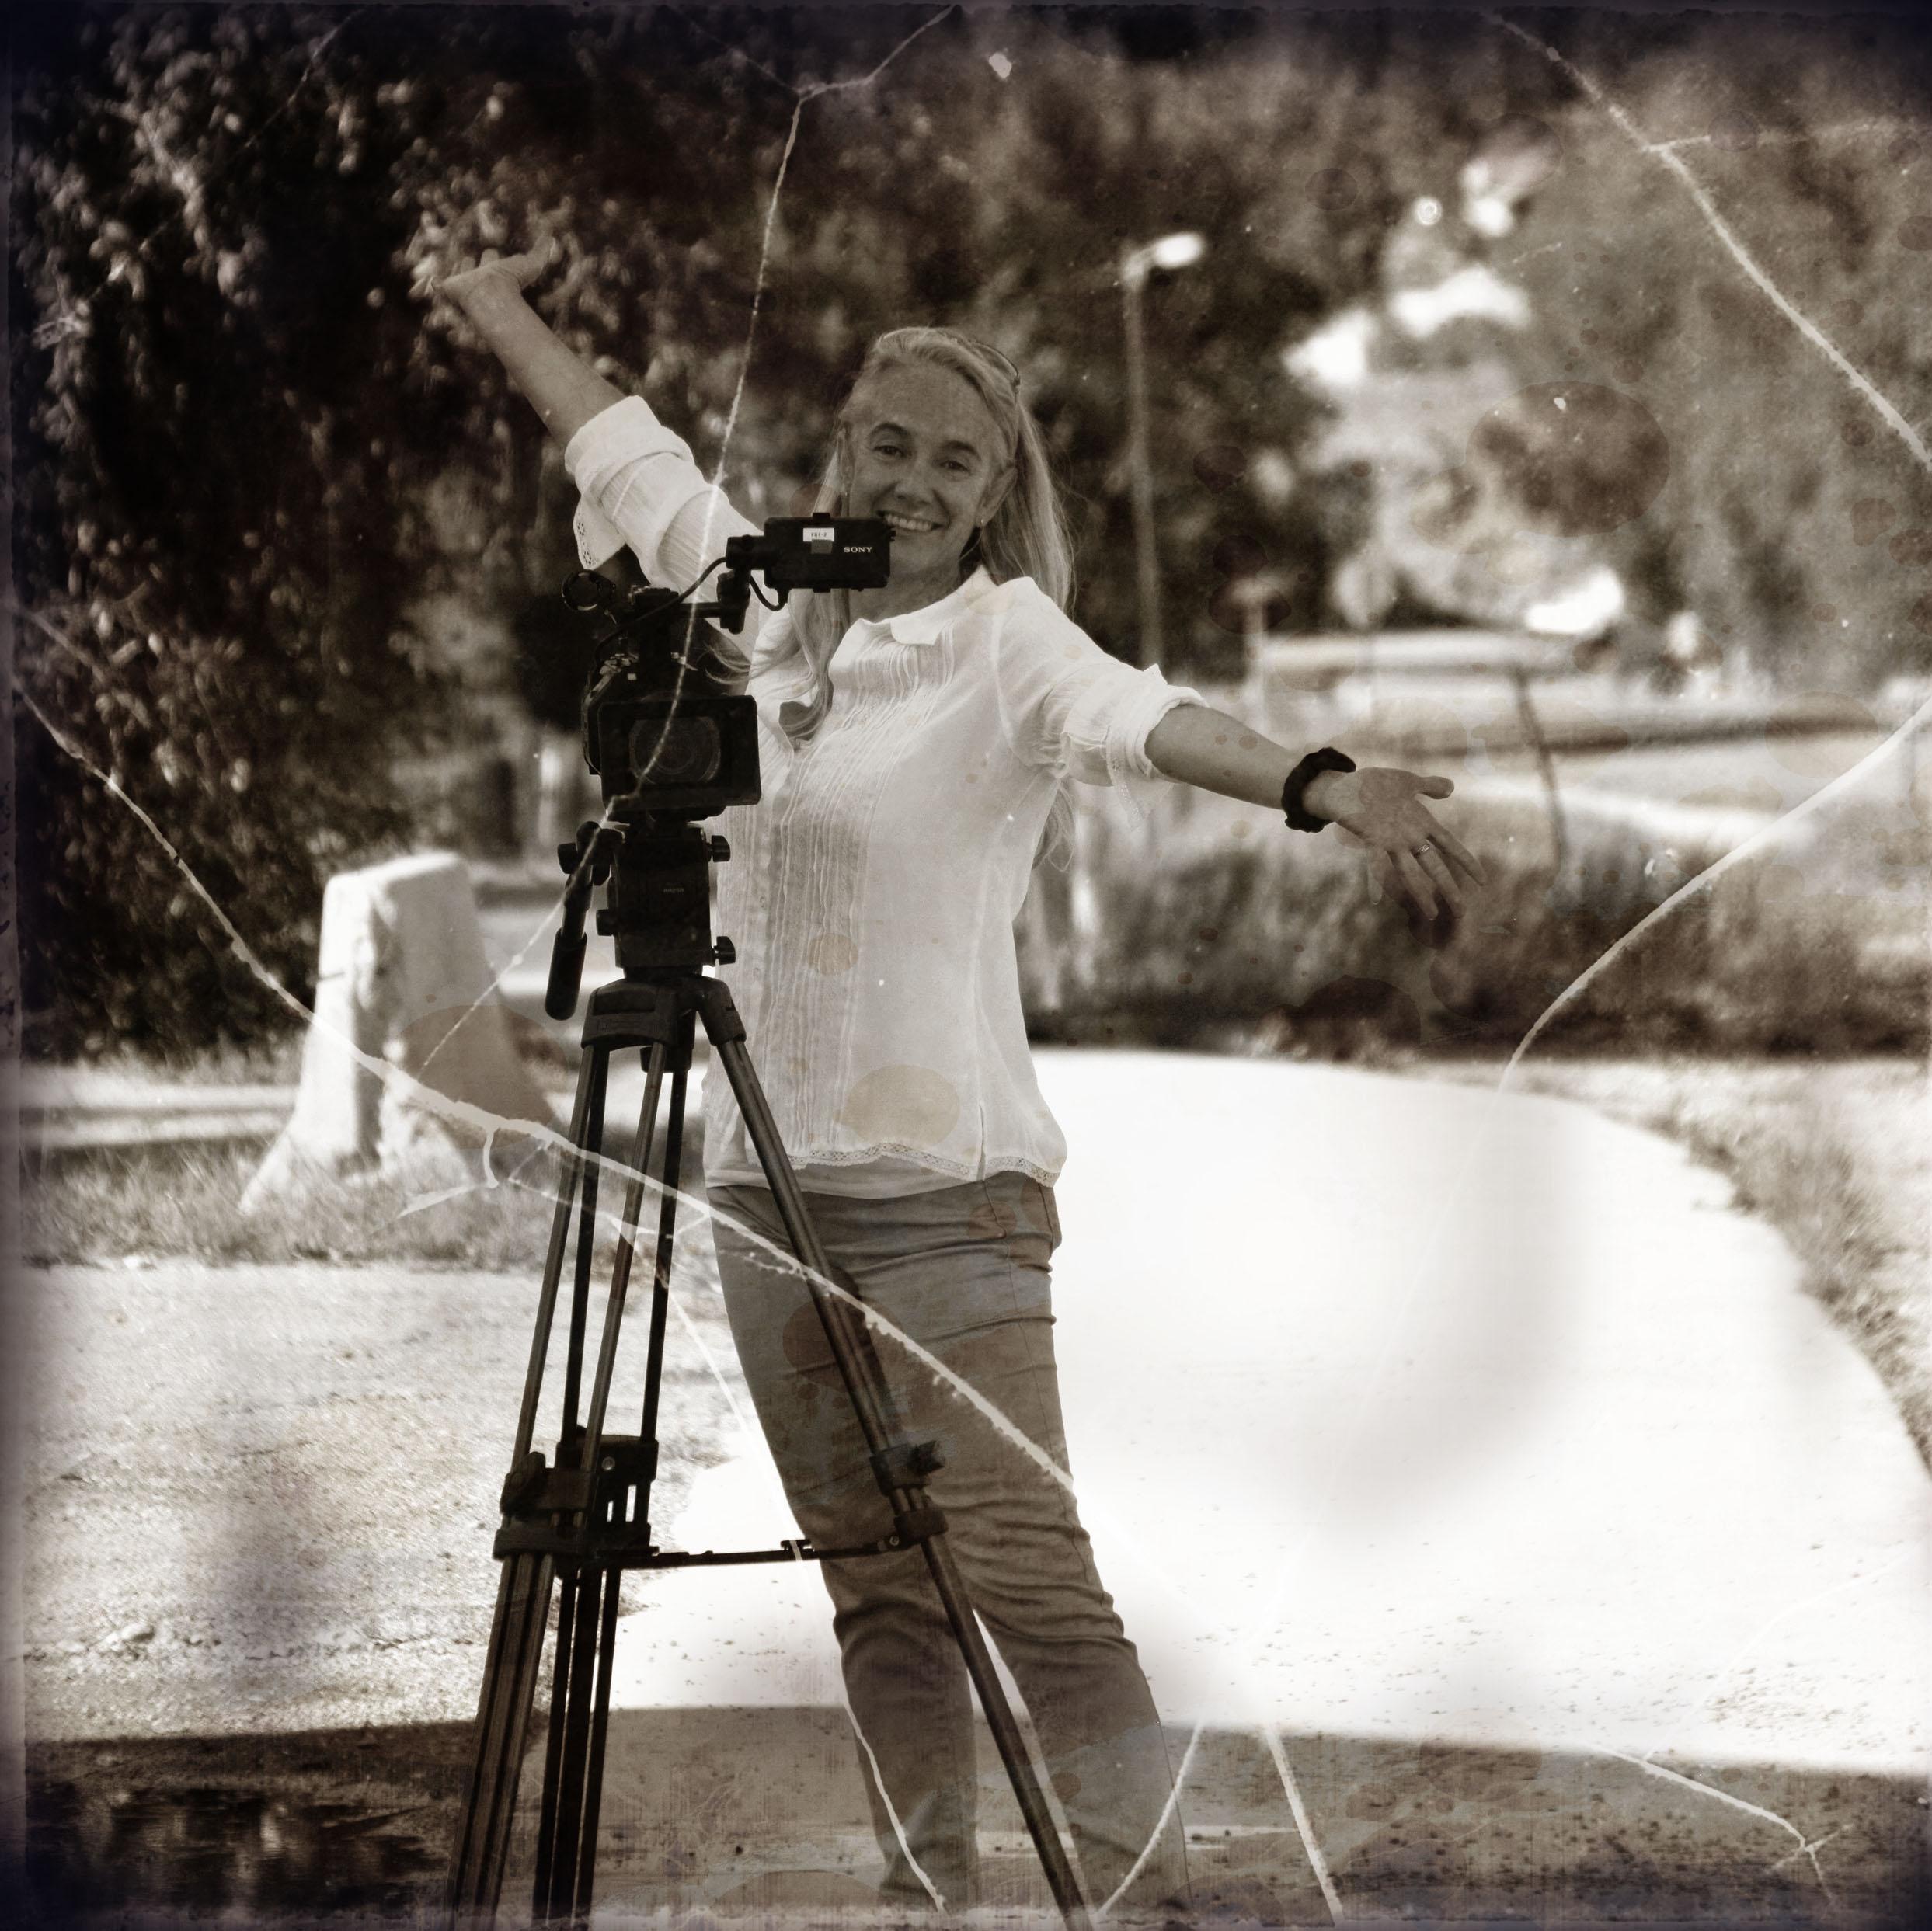 Julie Speer: Executive Producer/ Director/ Editor/ Creator